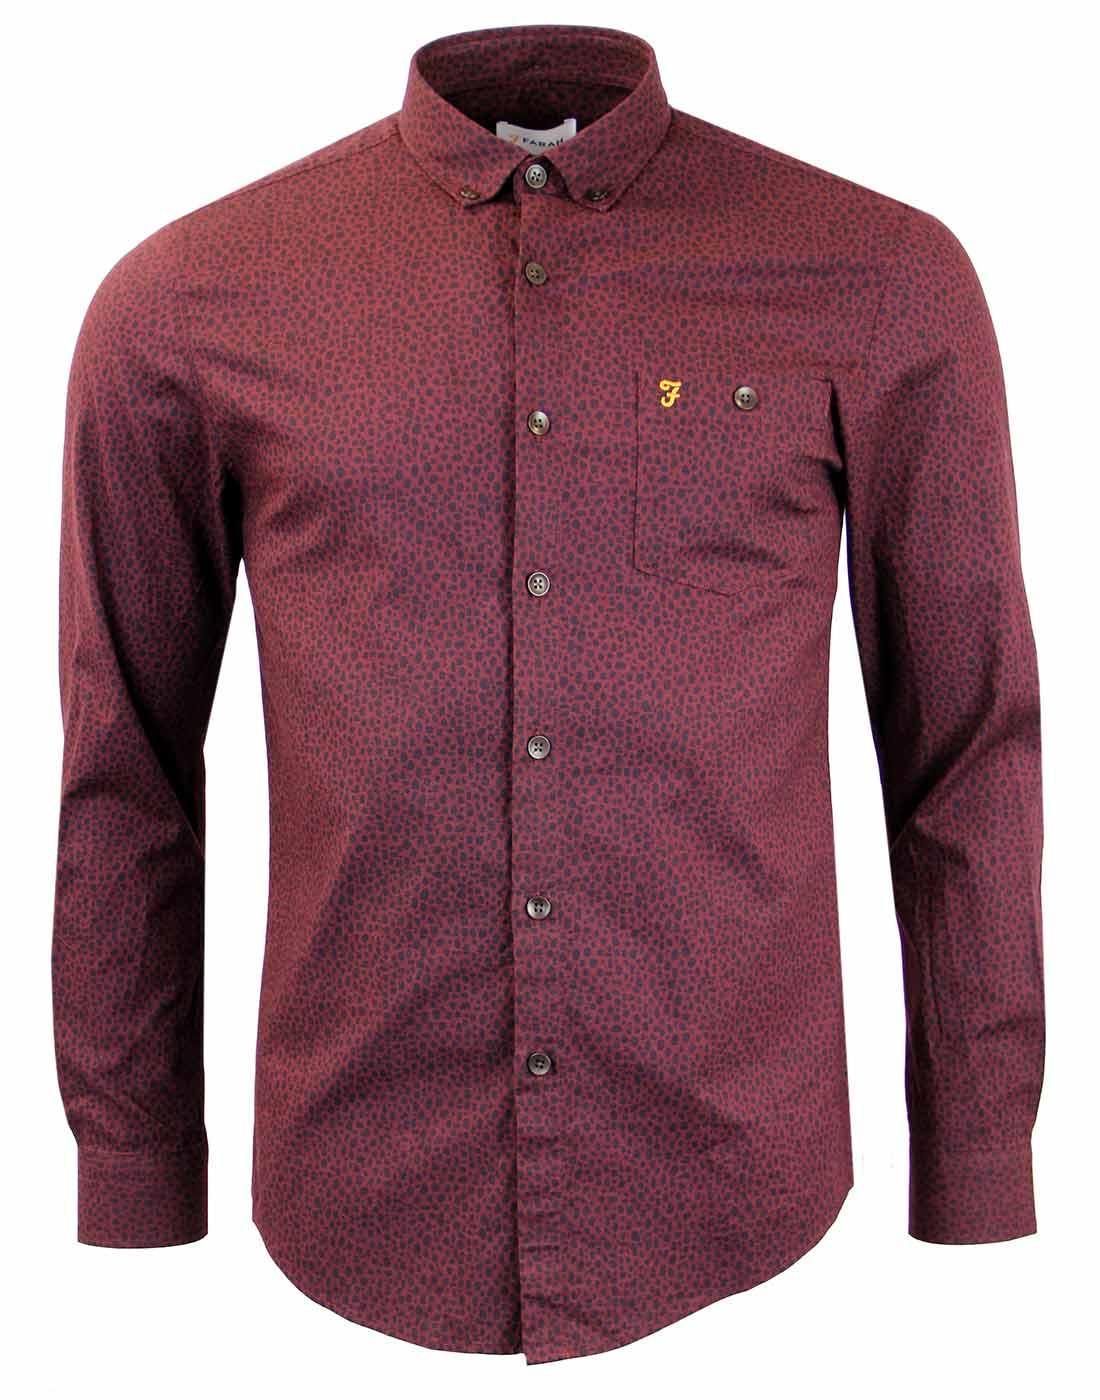 FARAH VINTAGE Penrith Leopard Print Retro Shirt